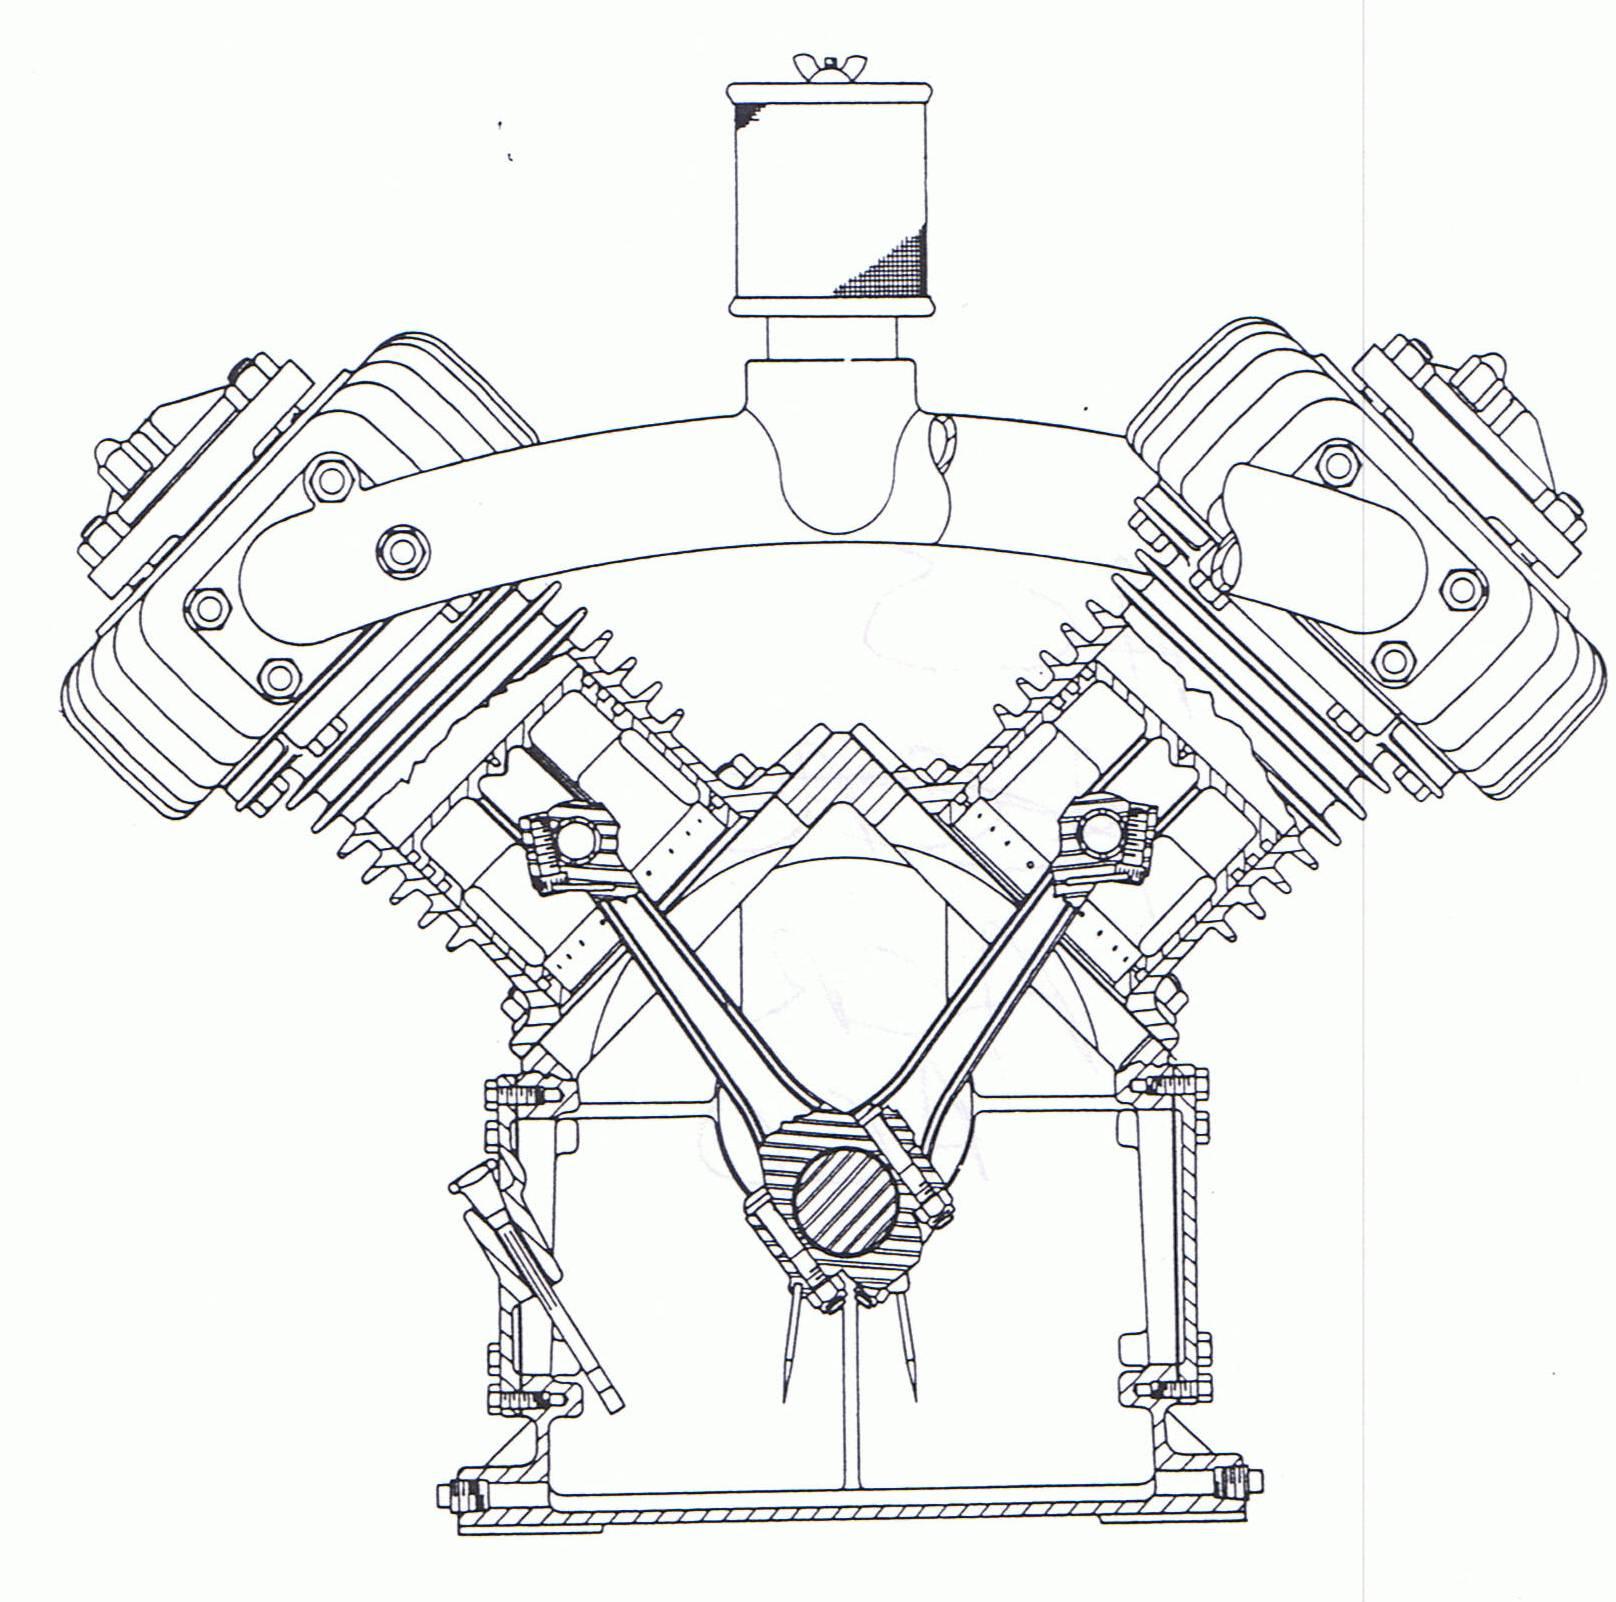 emglo compressor parts diagram